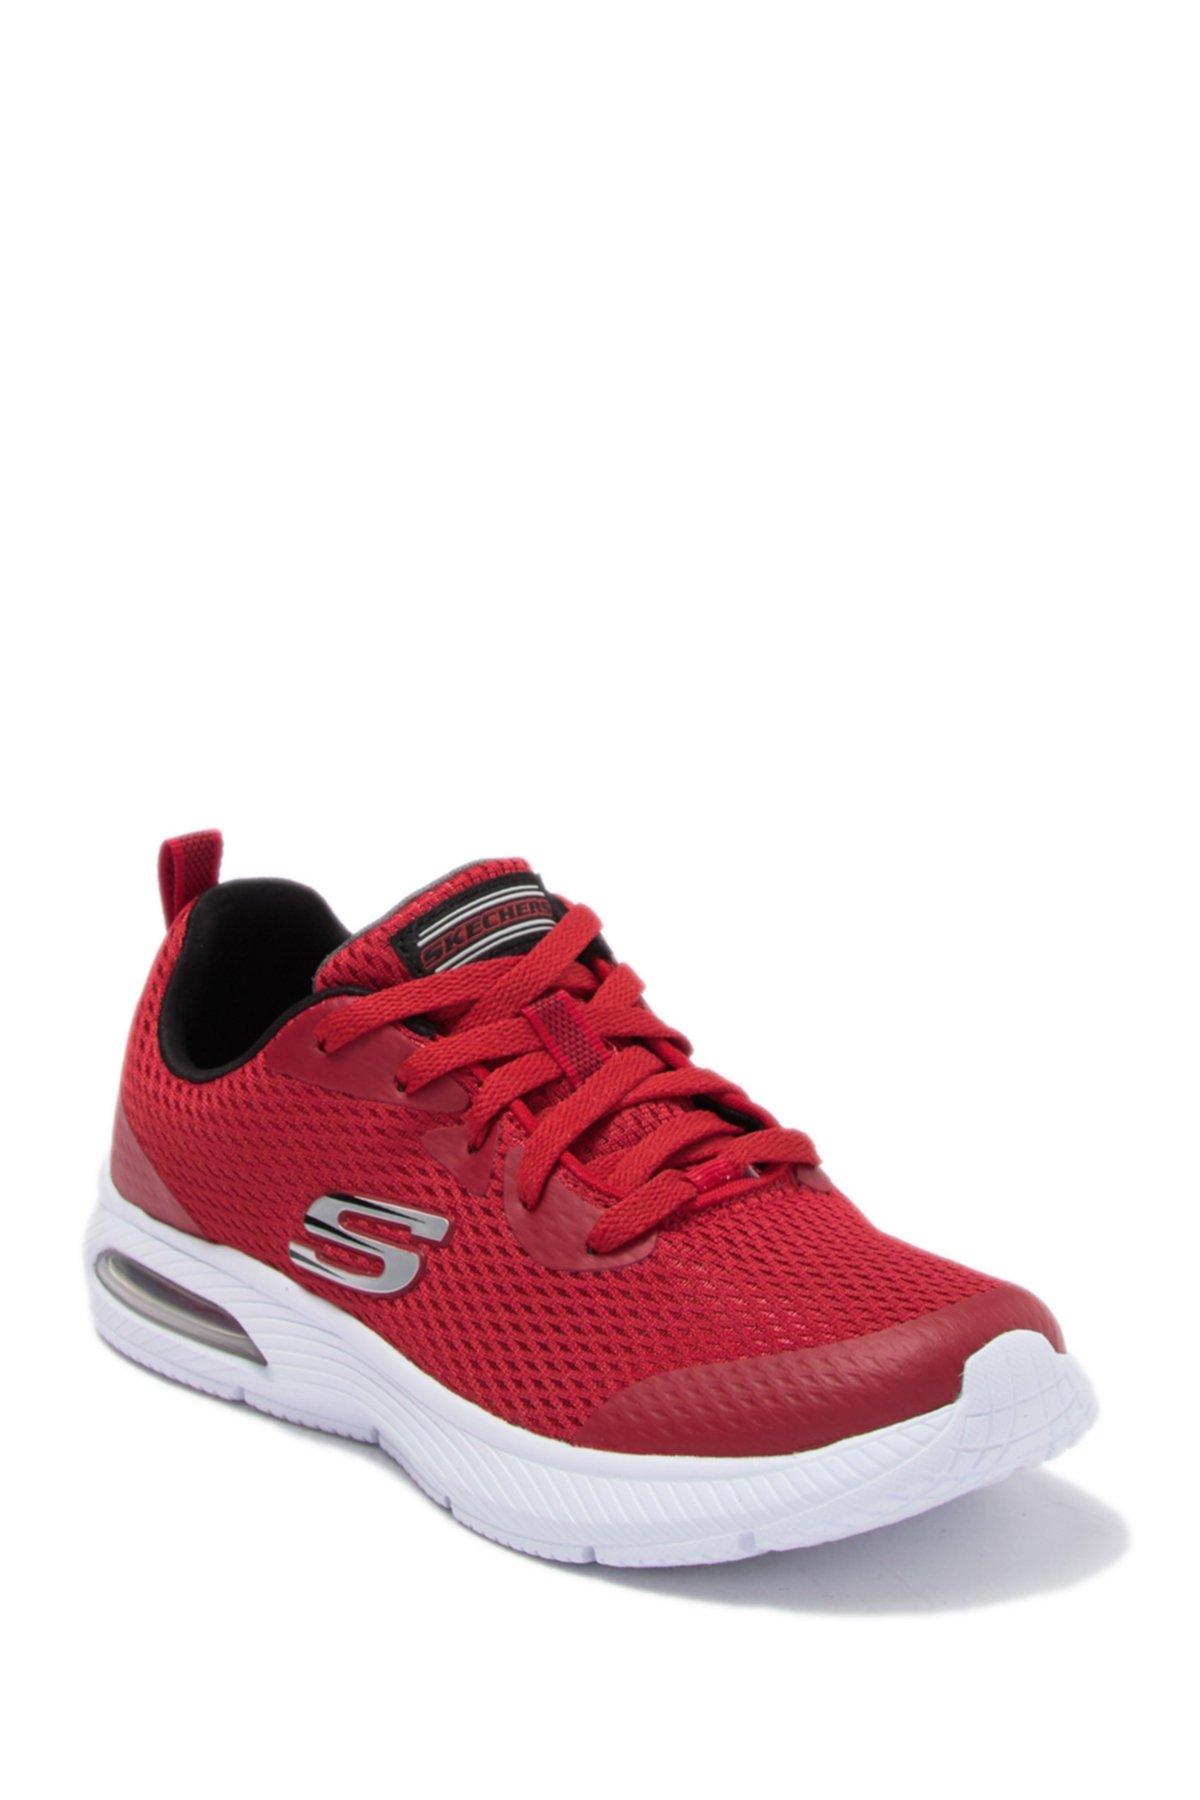 Dyna-Air Quick Pull Sneaker (Малыш, Малыш и Большой Малыш) SKECHERS